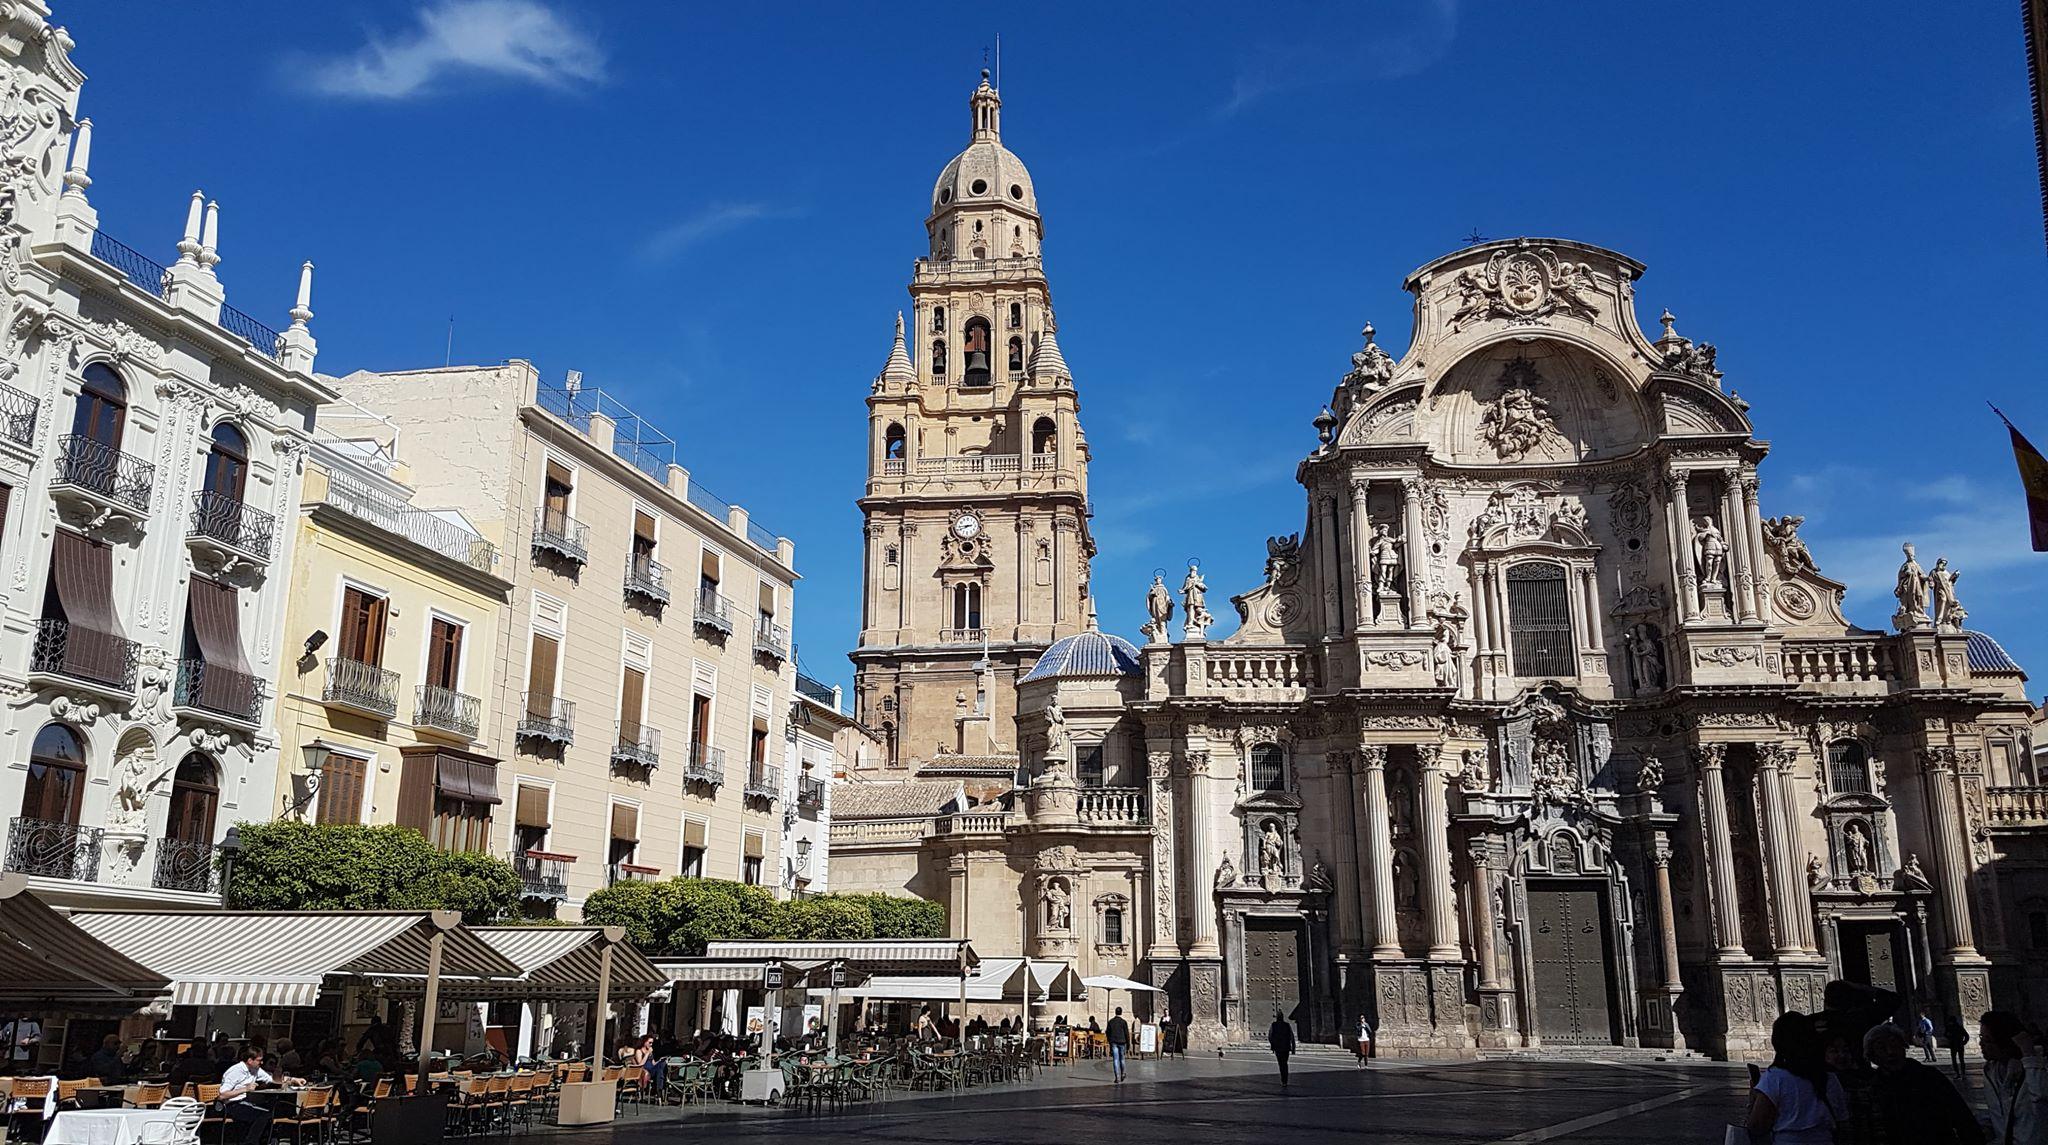 7 Katedralen i Murcia.jpg